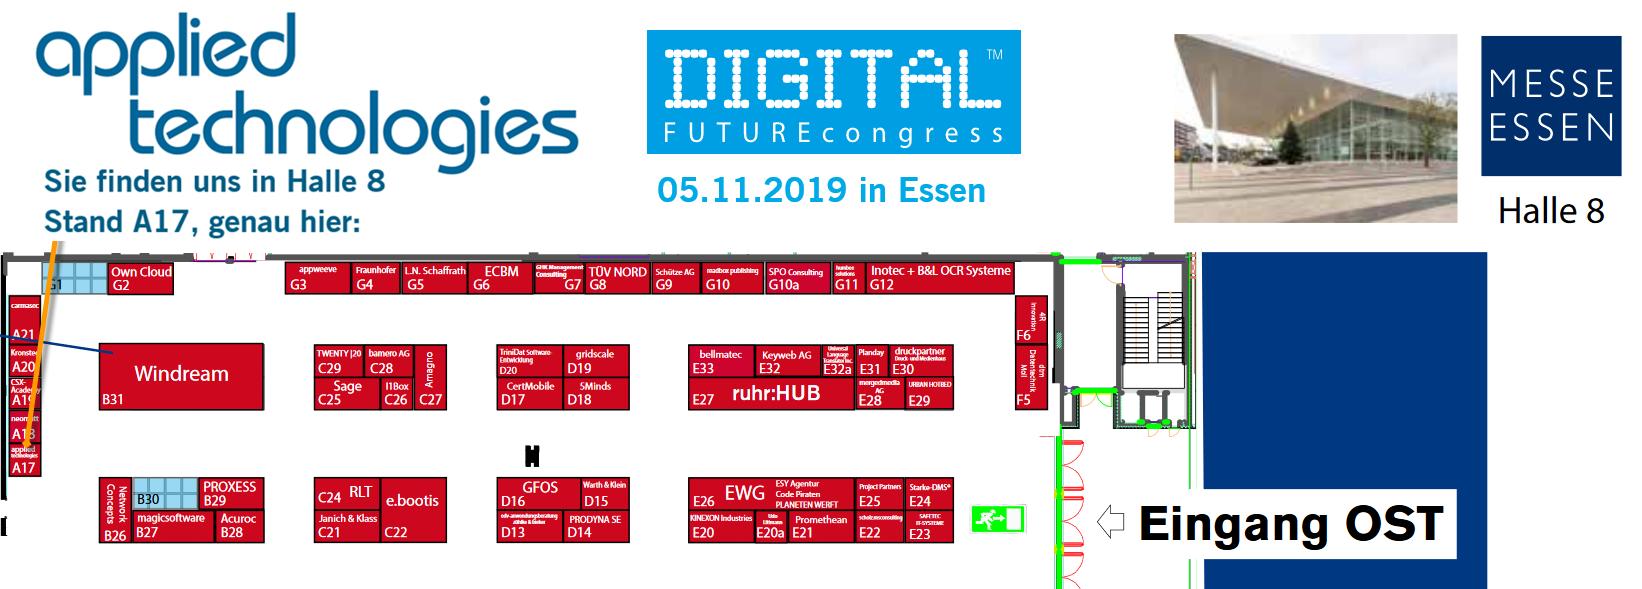 Hallenplan DIGTAL FUTUREcongress